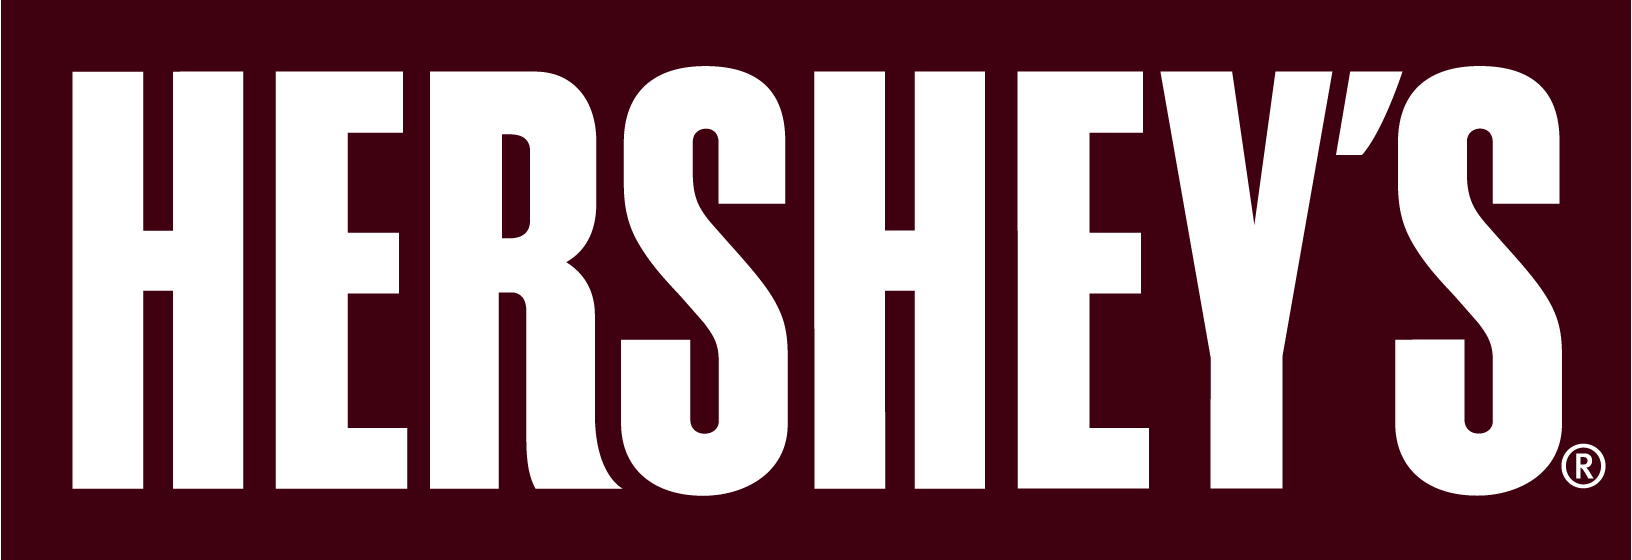 Images Easyfreeclipart Com 261 The Hershey Company Logo View 261125 Png Chocolate Milk Hershey Milk Chocolate Bar Chocolate Bar